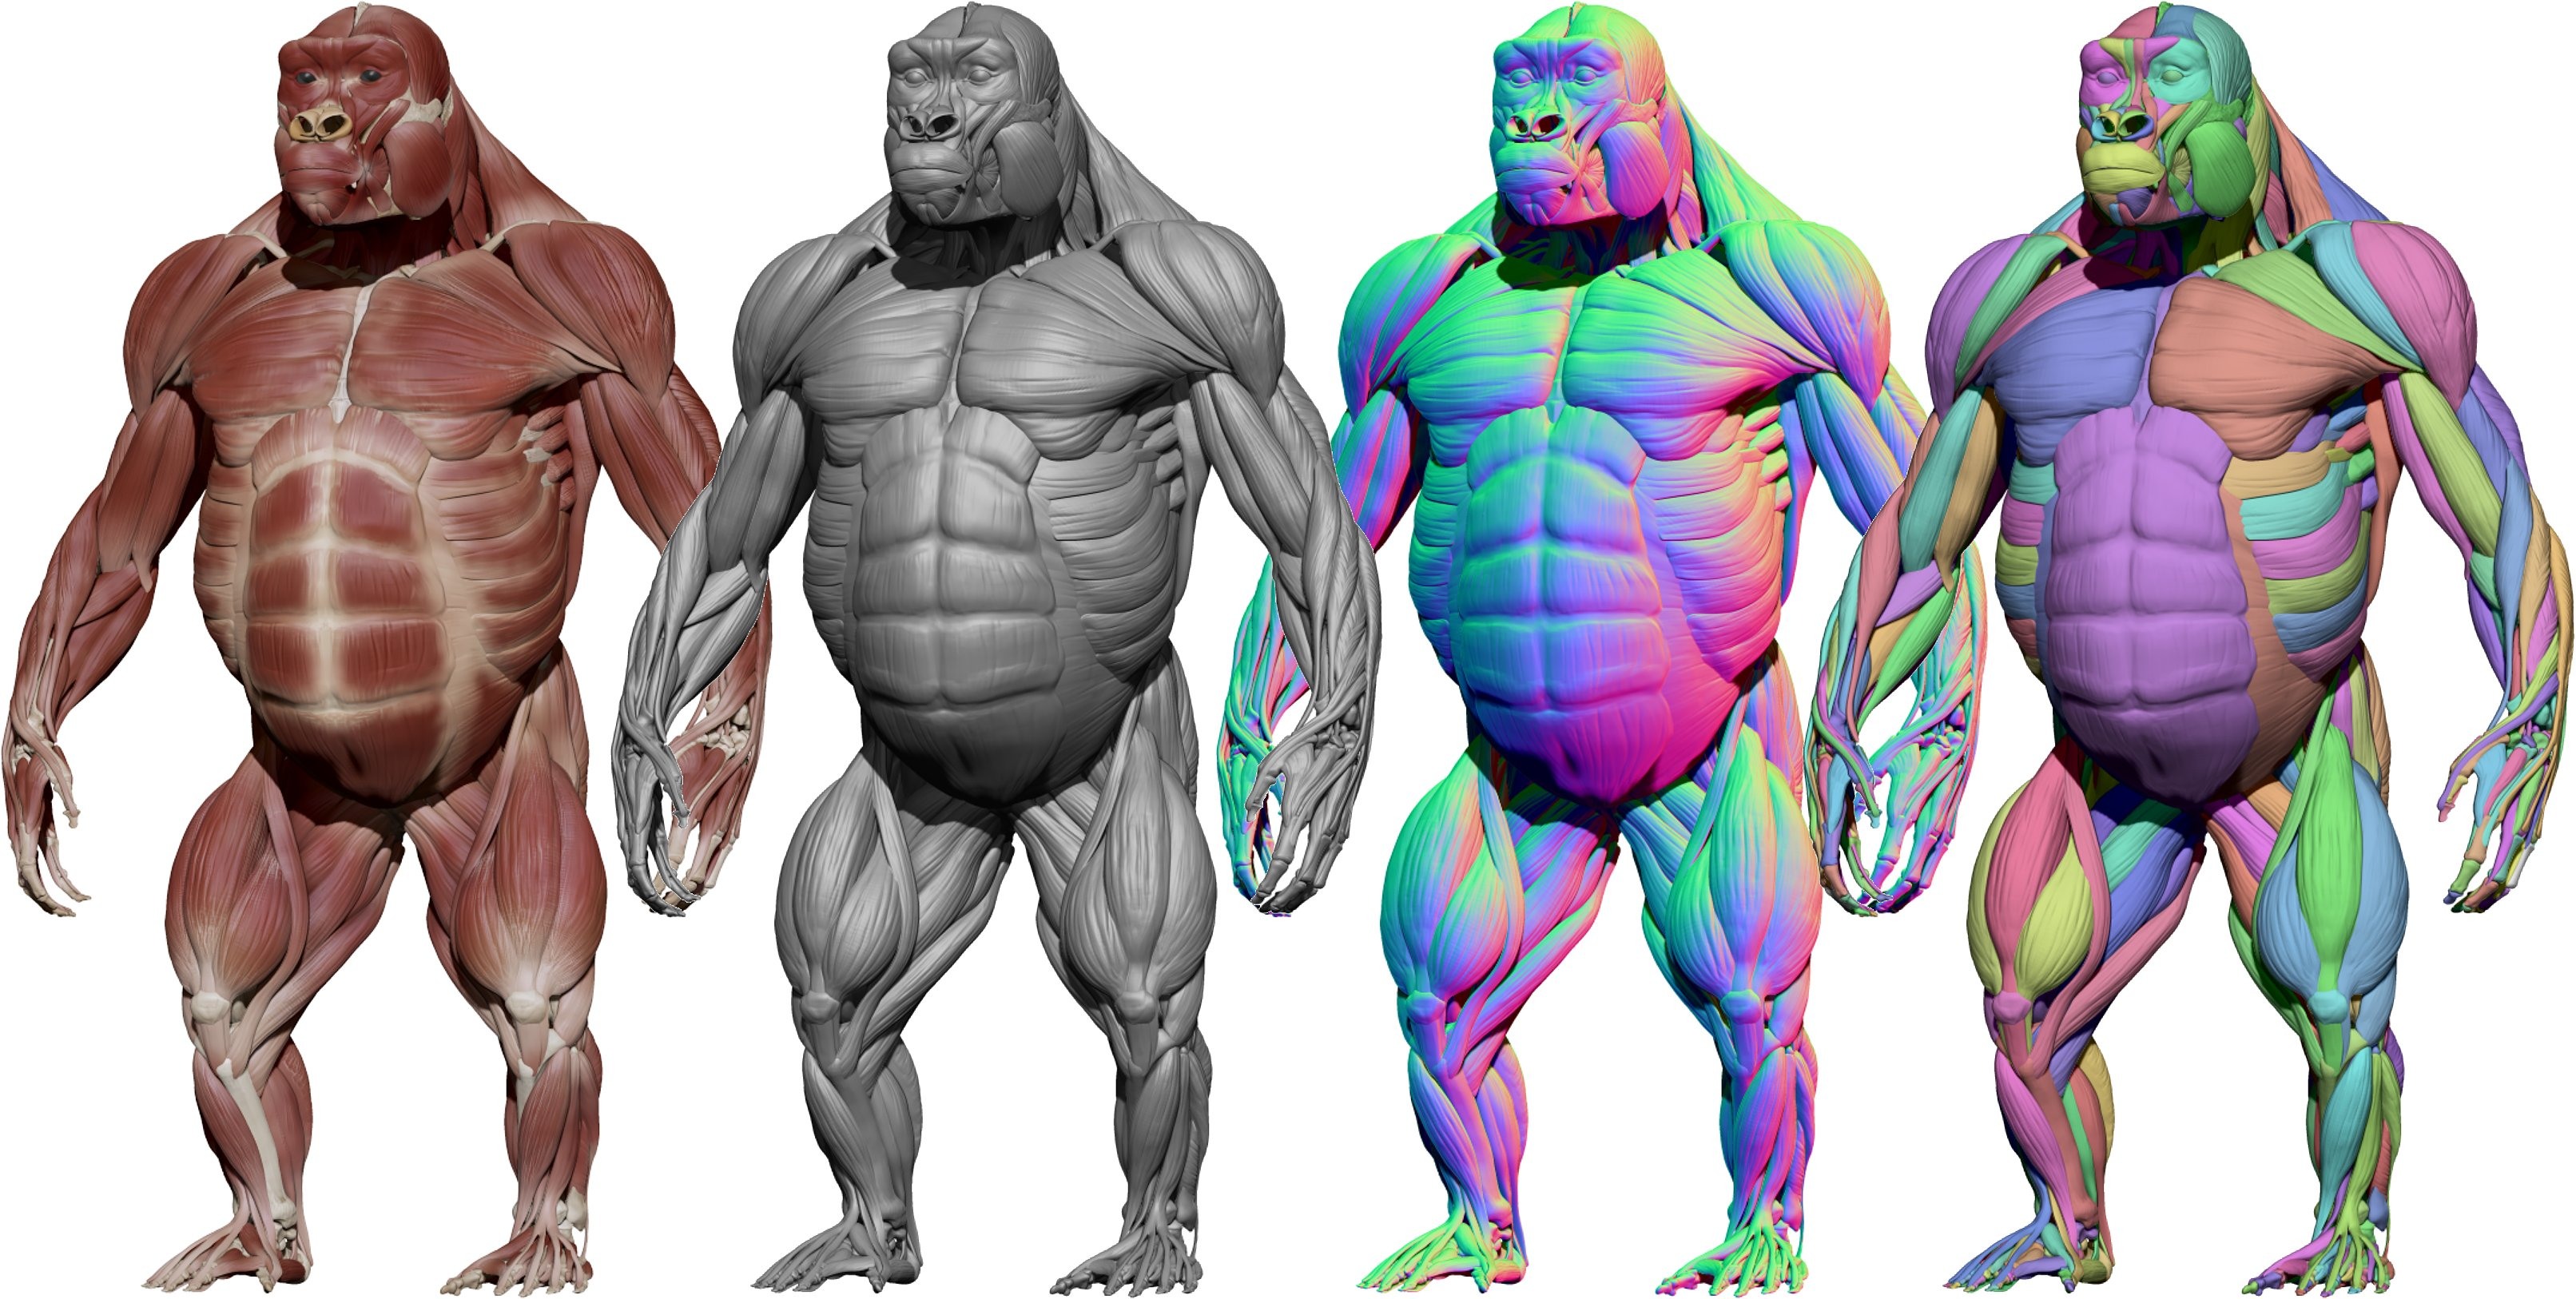 Download Zbrush Gorilla model